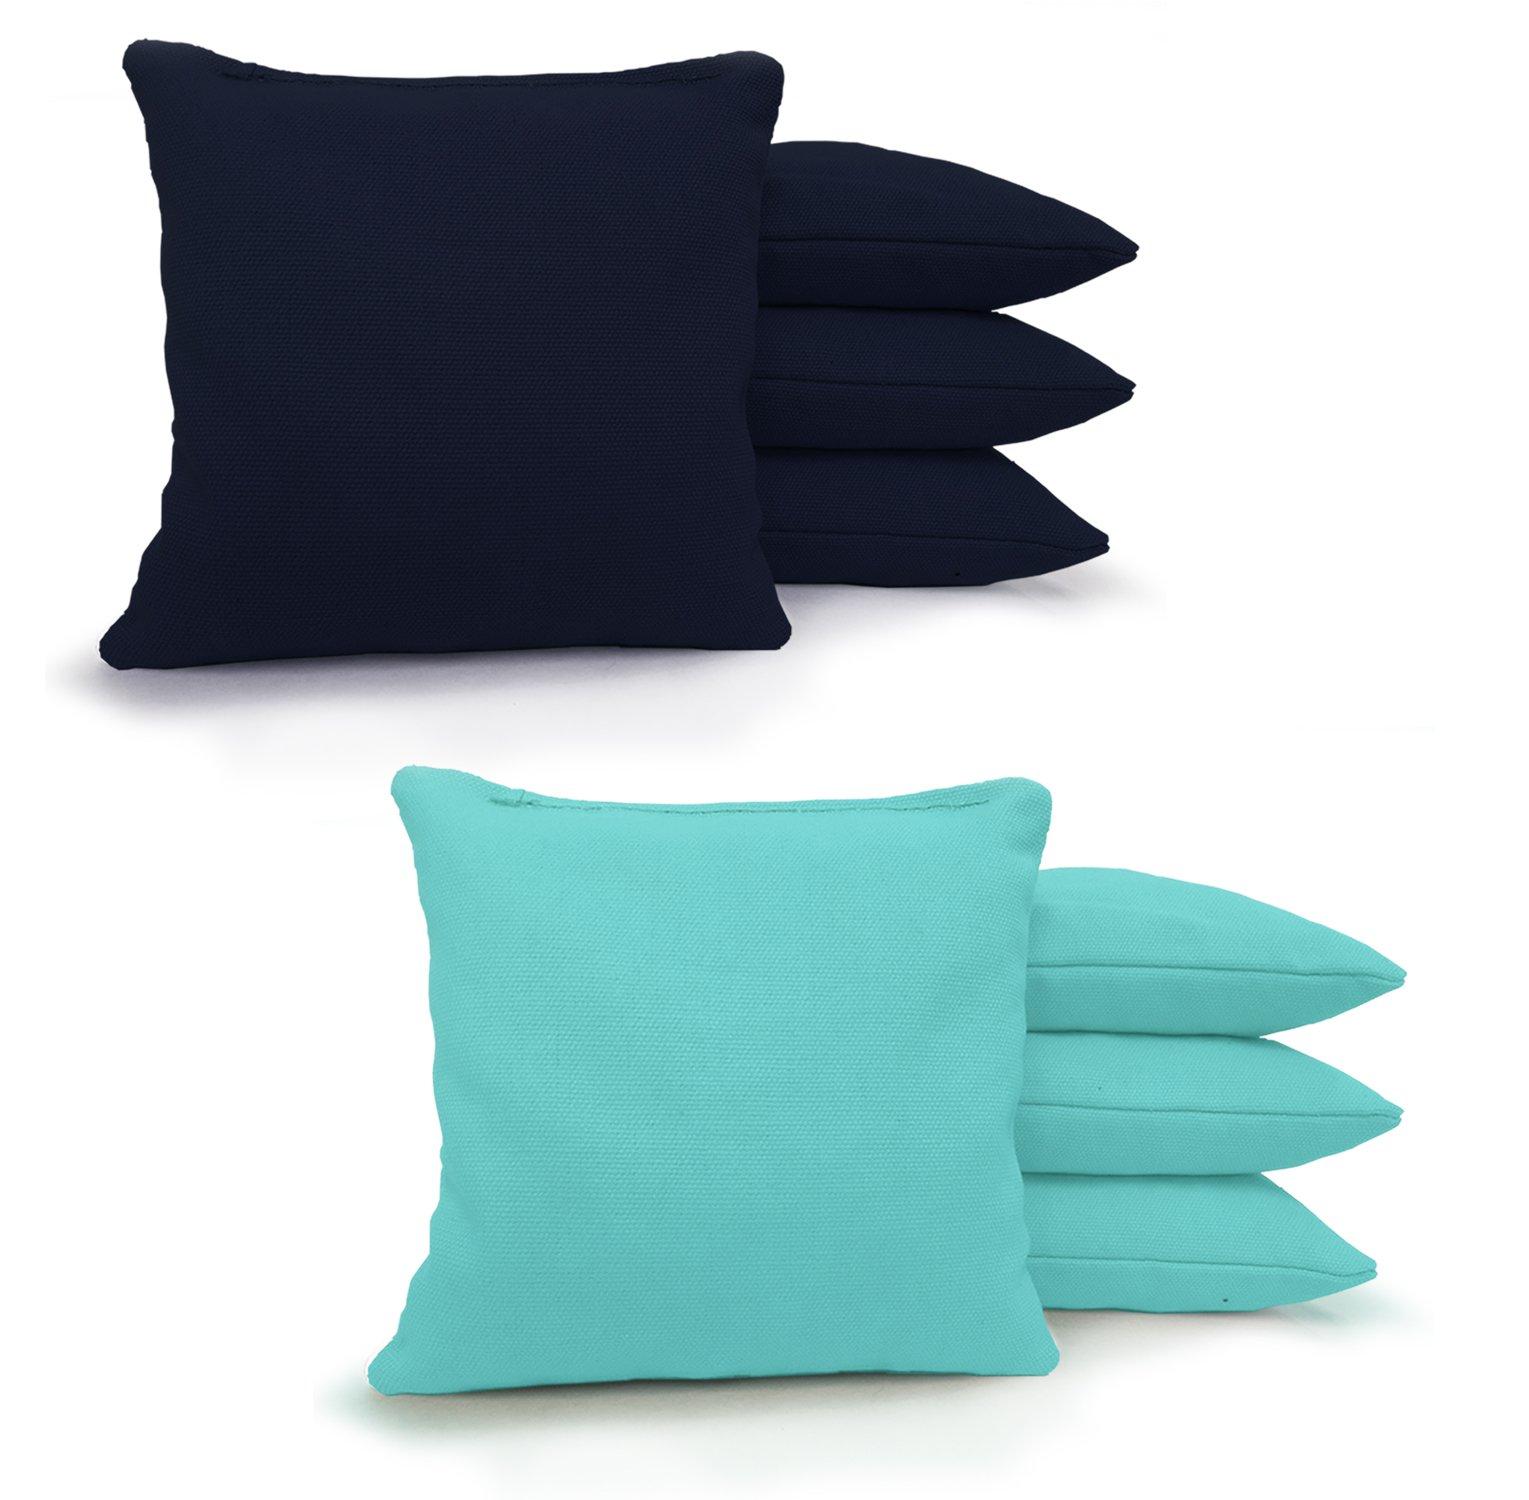 Johnson Enterprises, LLC 8 Standard Corn Filled Regulation 6''x6'' Duck Cloth Cornhole Bags! (Navy/Light Blue) by Johnson Enterprises, LLC